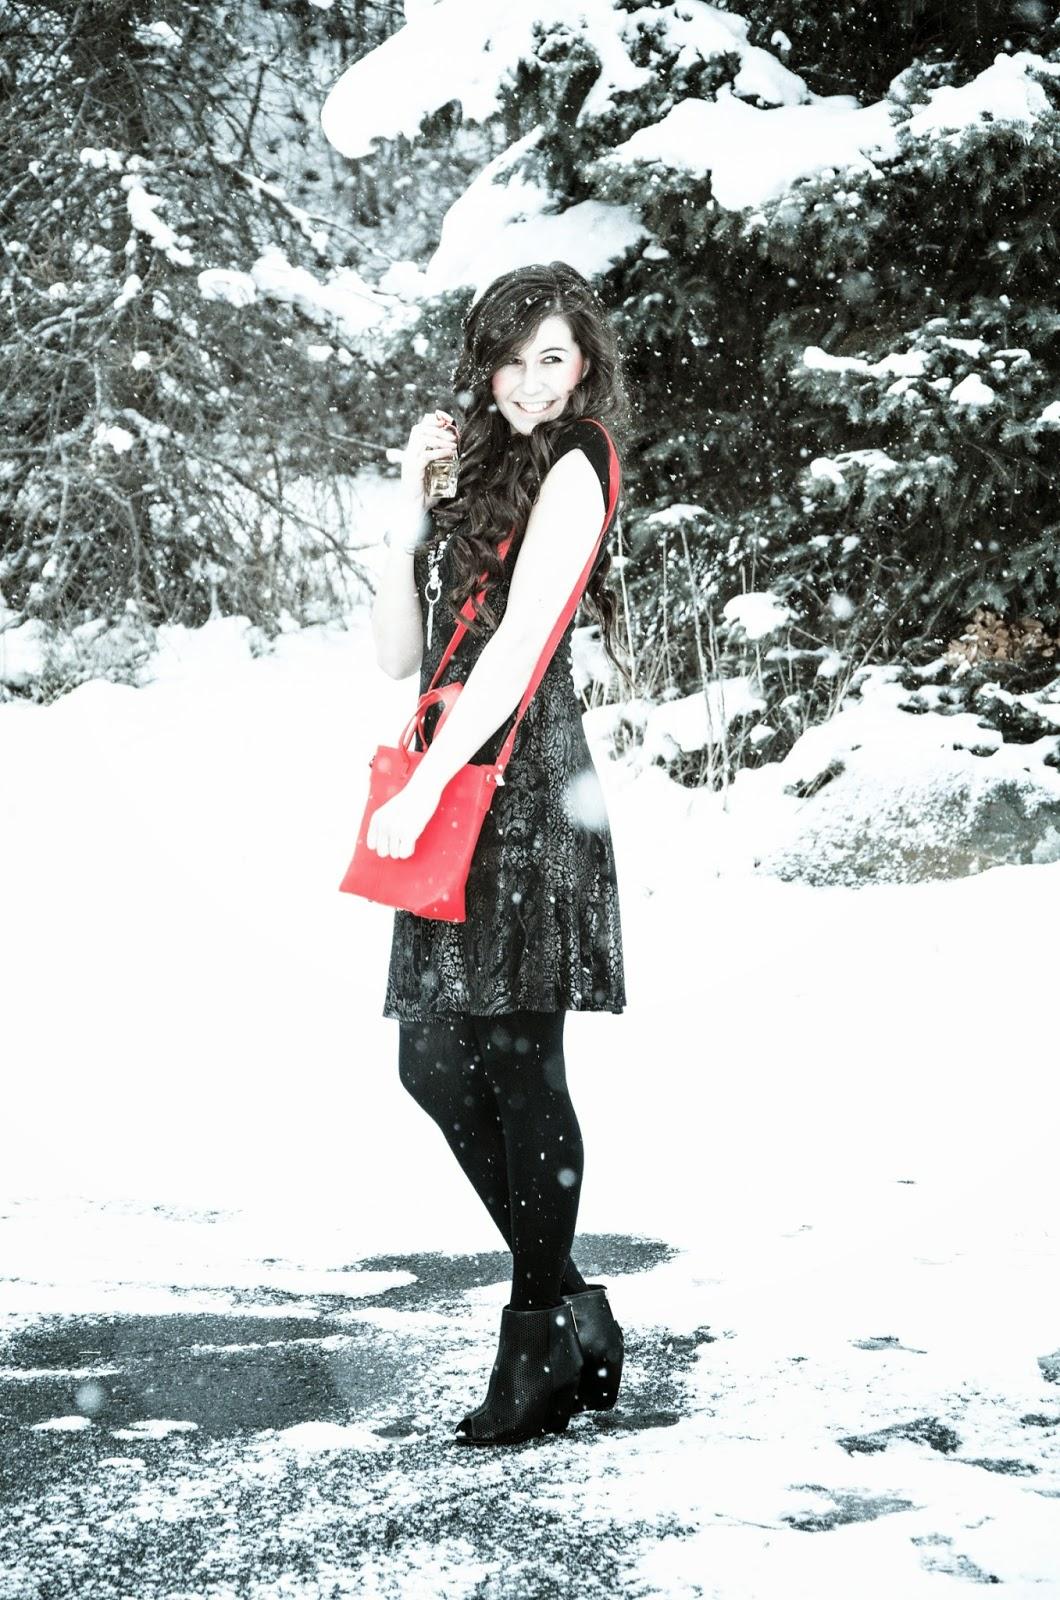 amiclubwear dress and shoes, ankle booties, booties, Christmas dress, christmas outfit, pretty girl, viva la juicy, viva la juicy perfume, red handbag, holiday dress, holiday outfit, snowy outfit post,